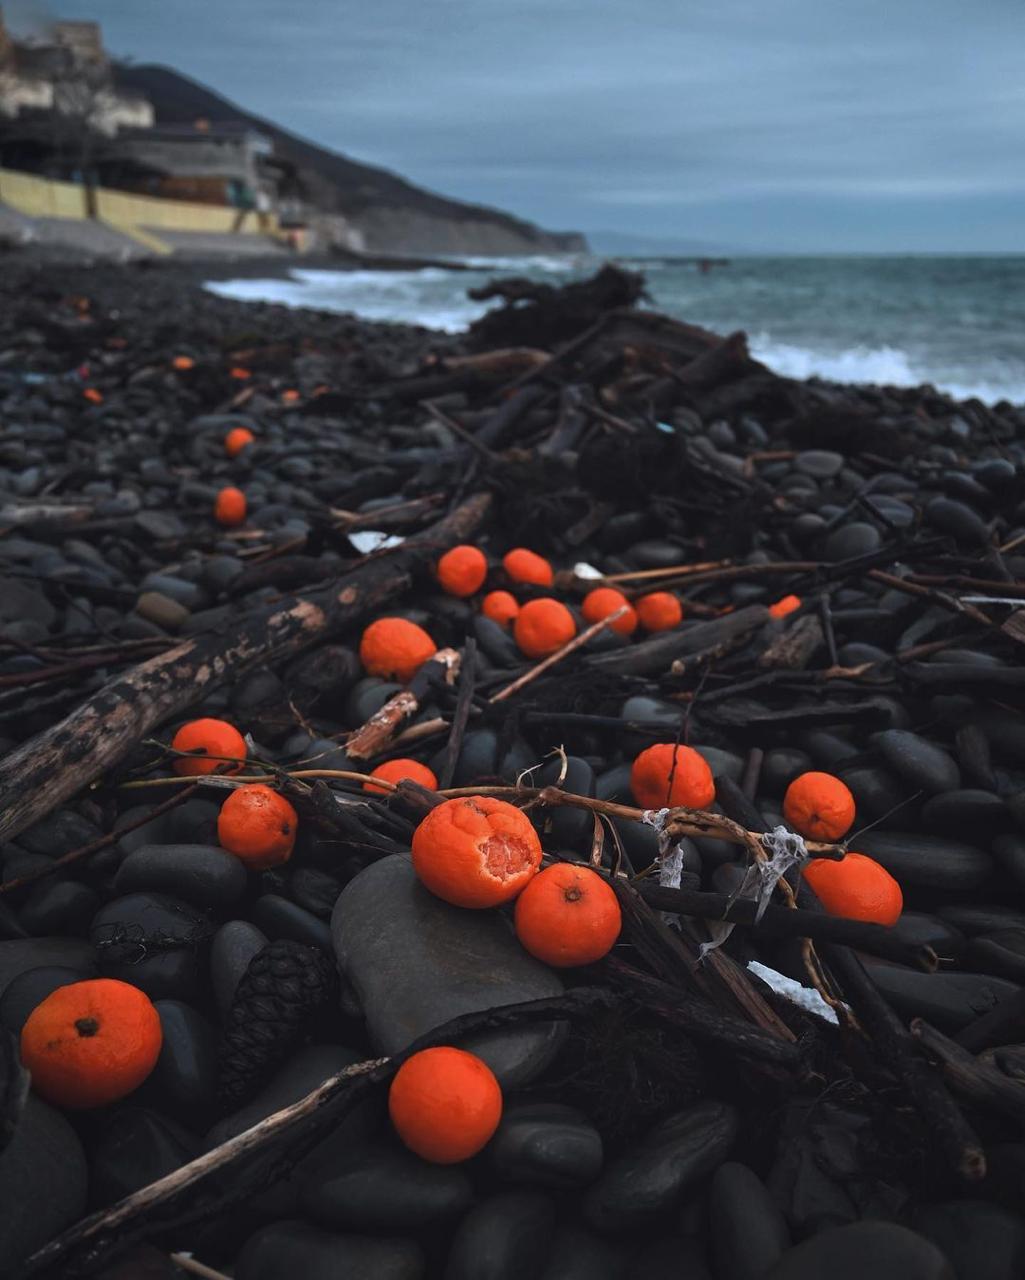 Широкая Балка после шторма оказалась усыпана мандаринами